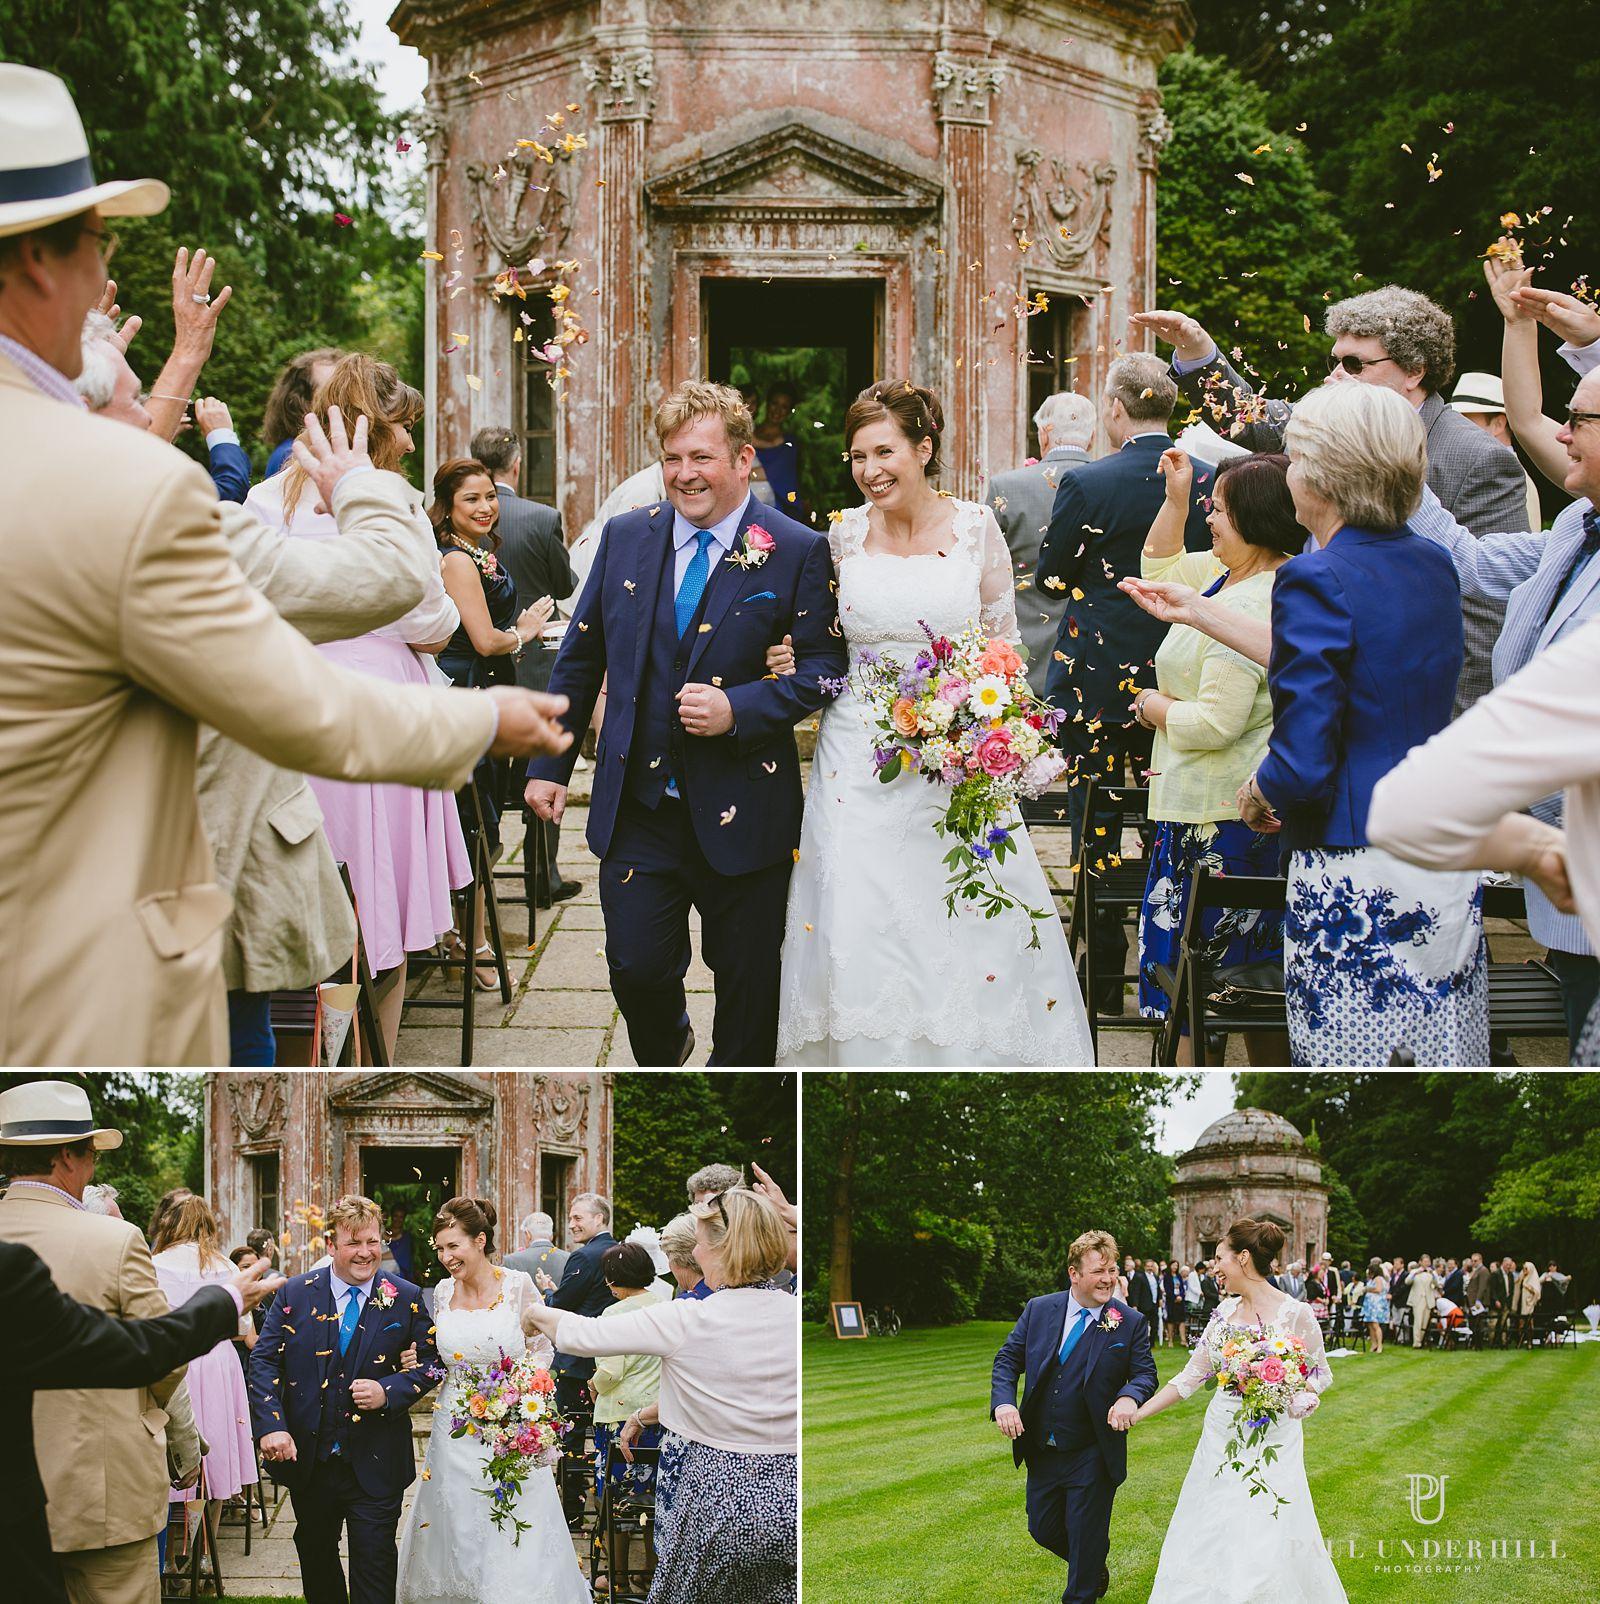 Wedding photographers Wiltshire